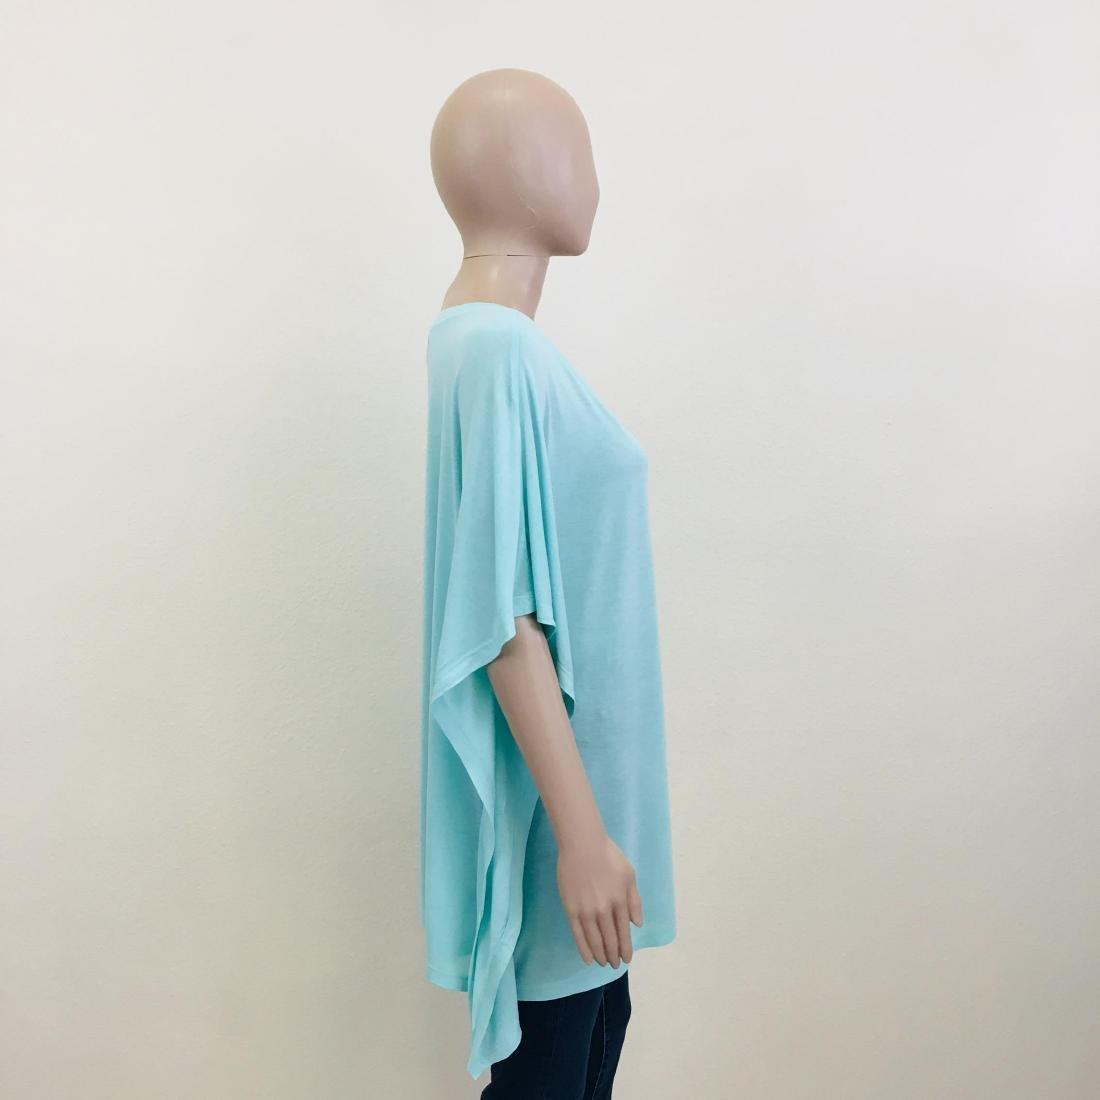 New Women's ZARA Top Blouse Size M - 7